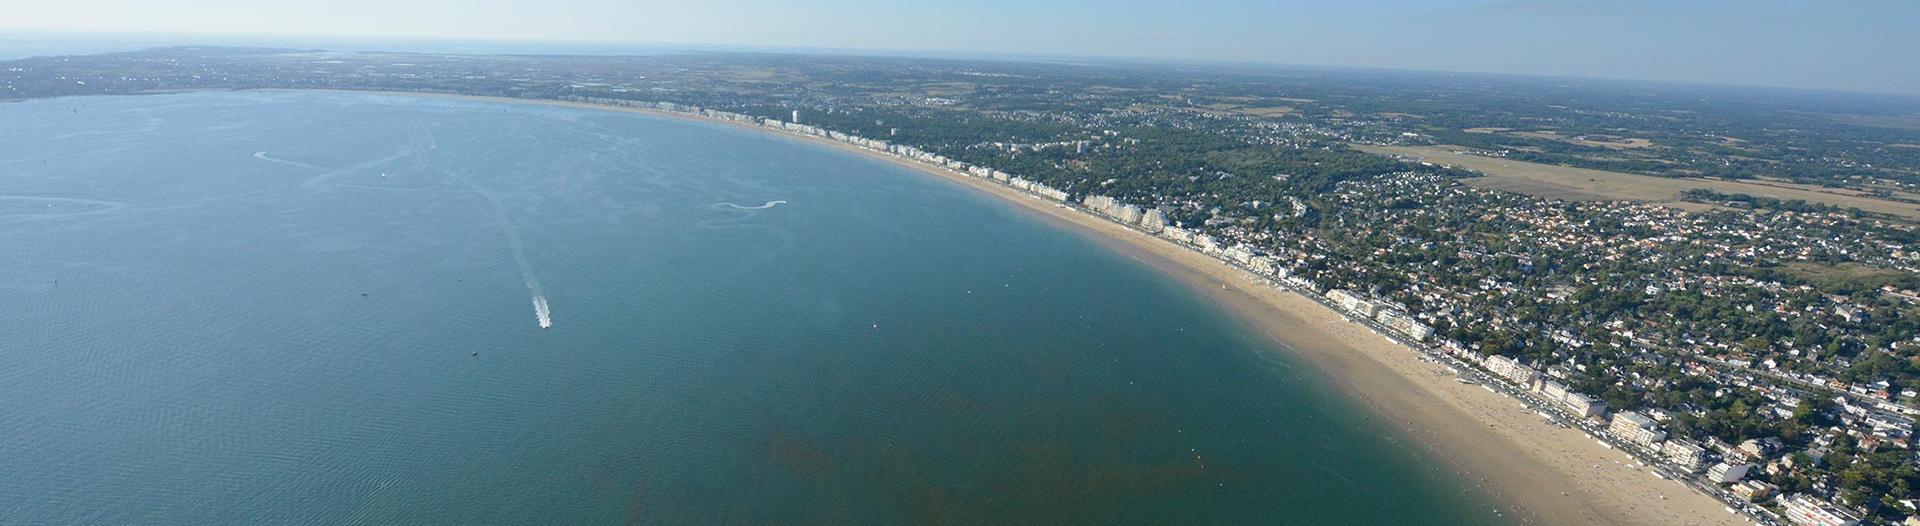 slider-region-loire-atlantique-plage-pornichet